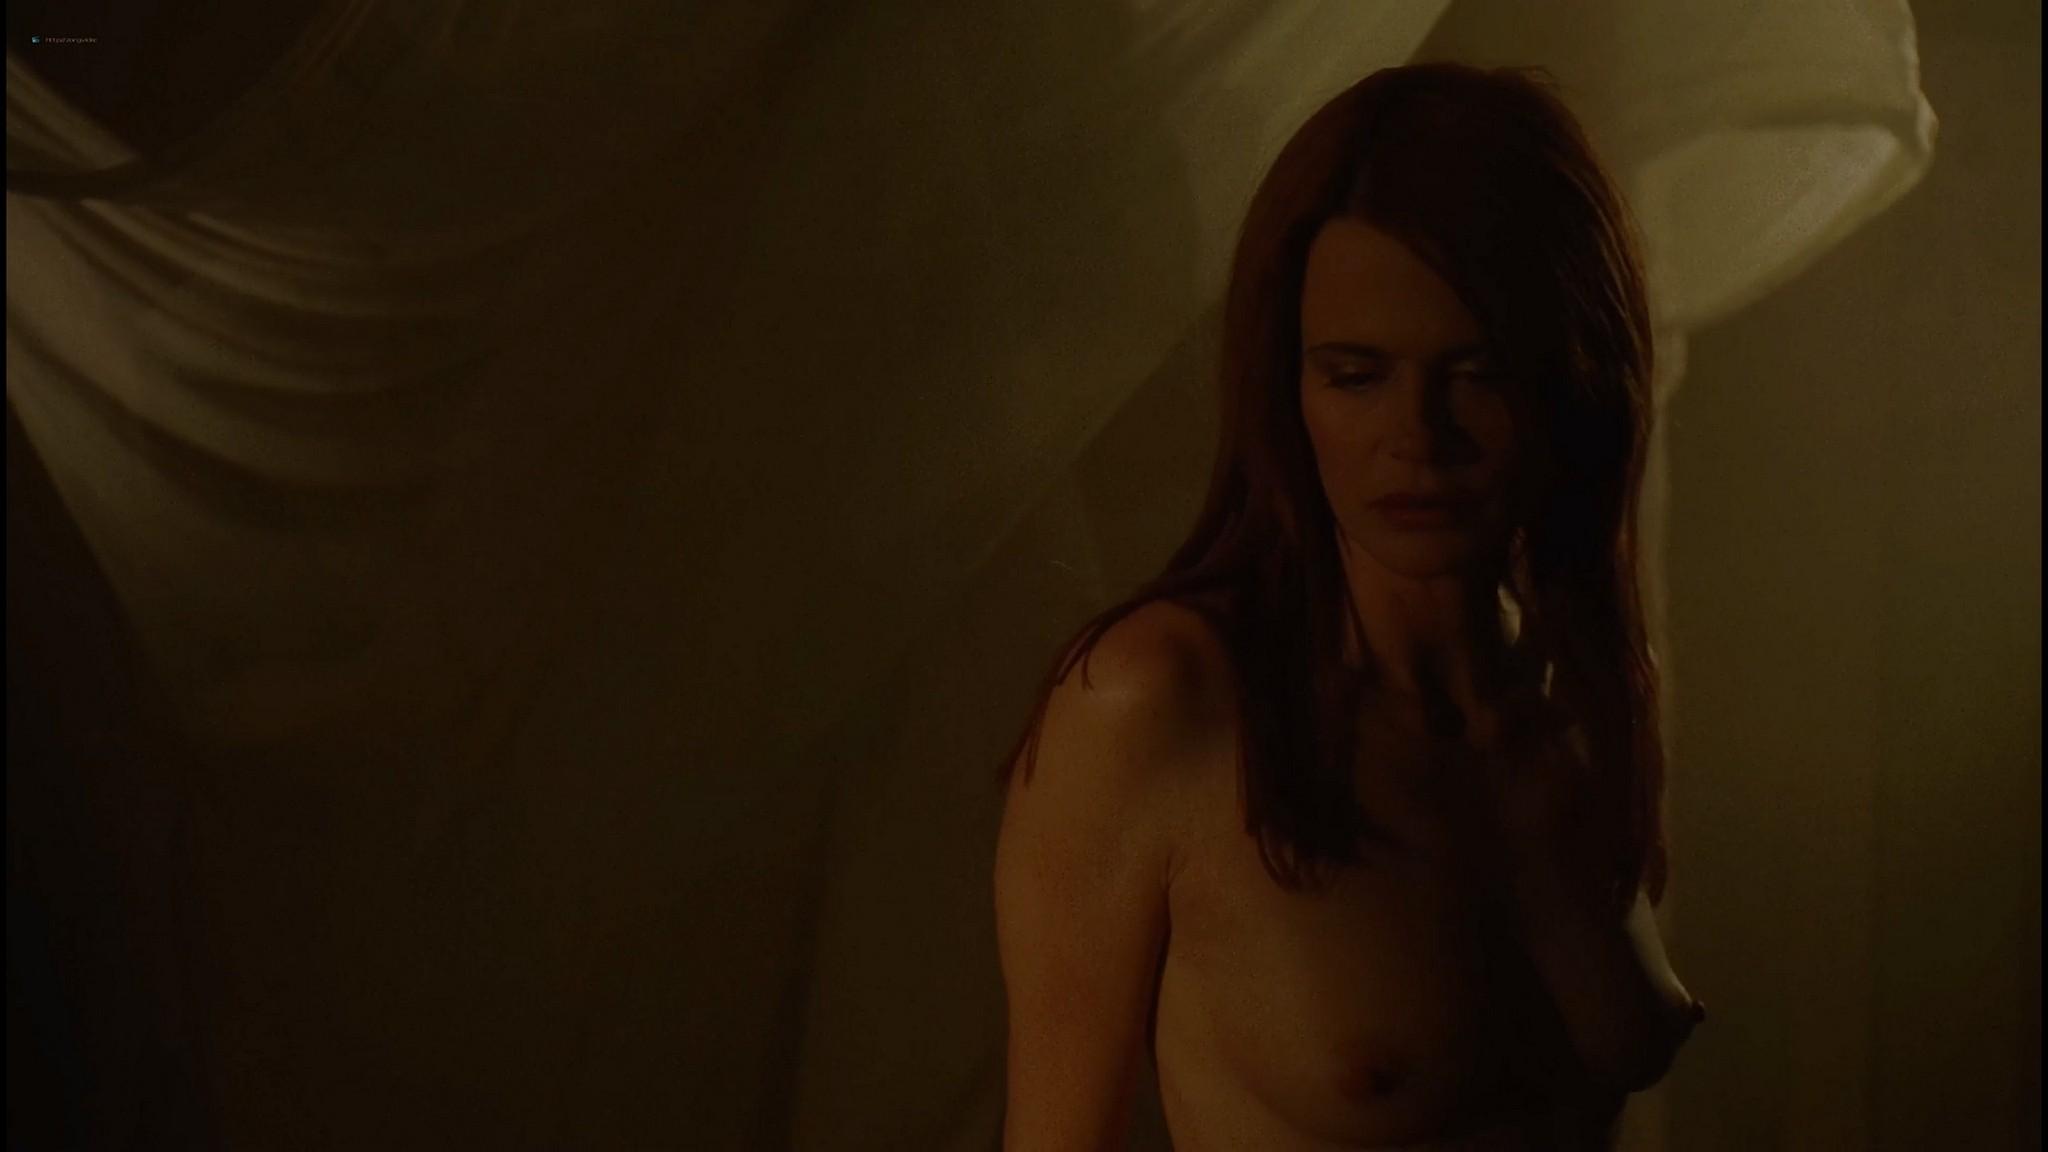 Serena Scott Thomas nude sex Sarah Lassez and others nude too Brothel 2008 1080p Web 5